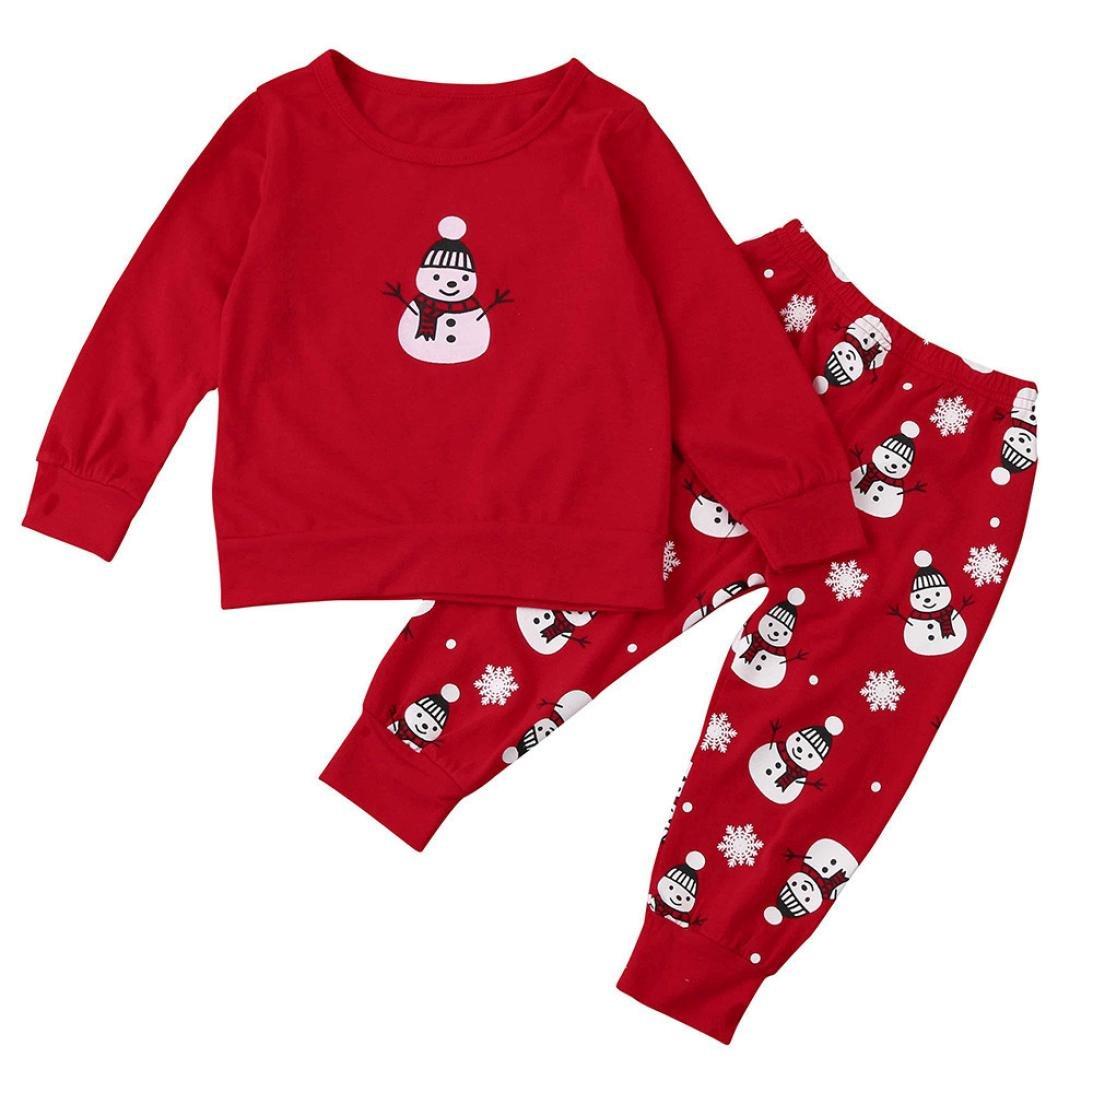 Xshuai for 0-24 Months Kids, 2Pcs Newborn Infant Toddler Baby Girls Boys Christmas Outfits Clothes Print T-Shirt Tops+Pants Set